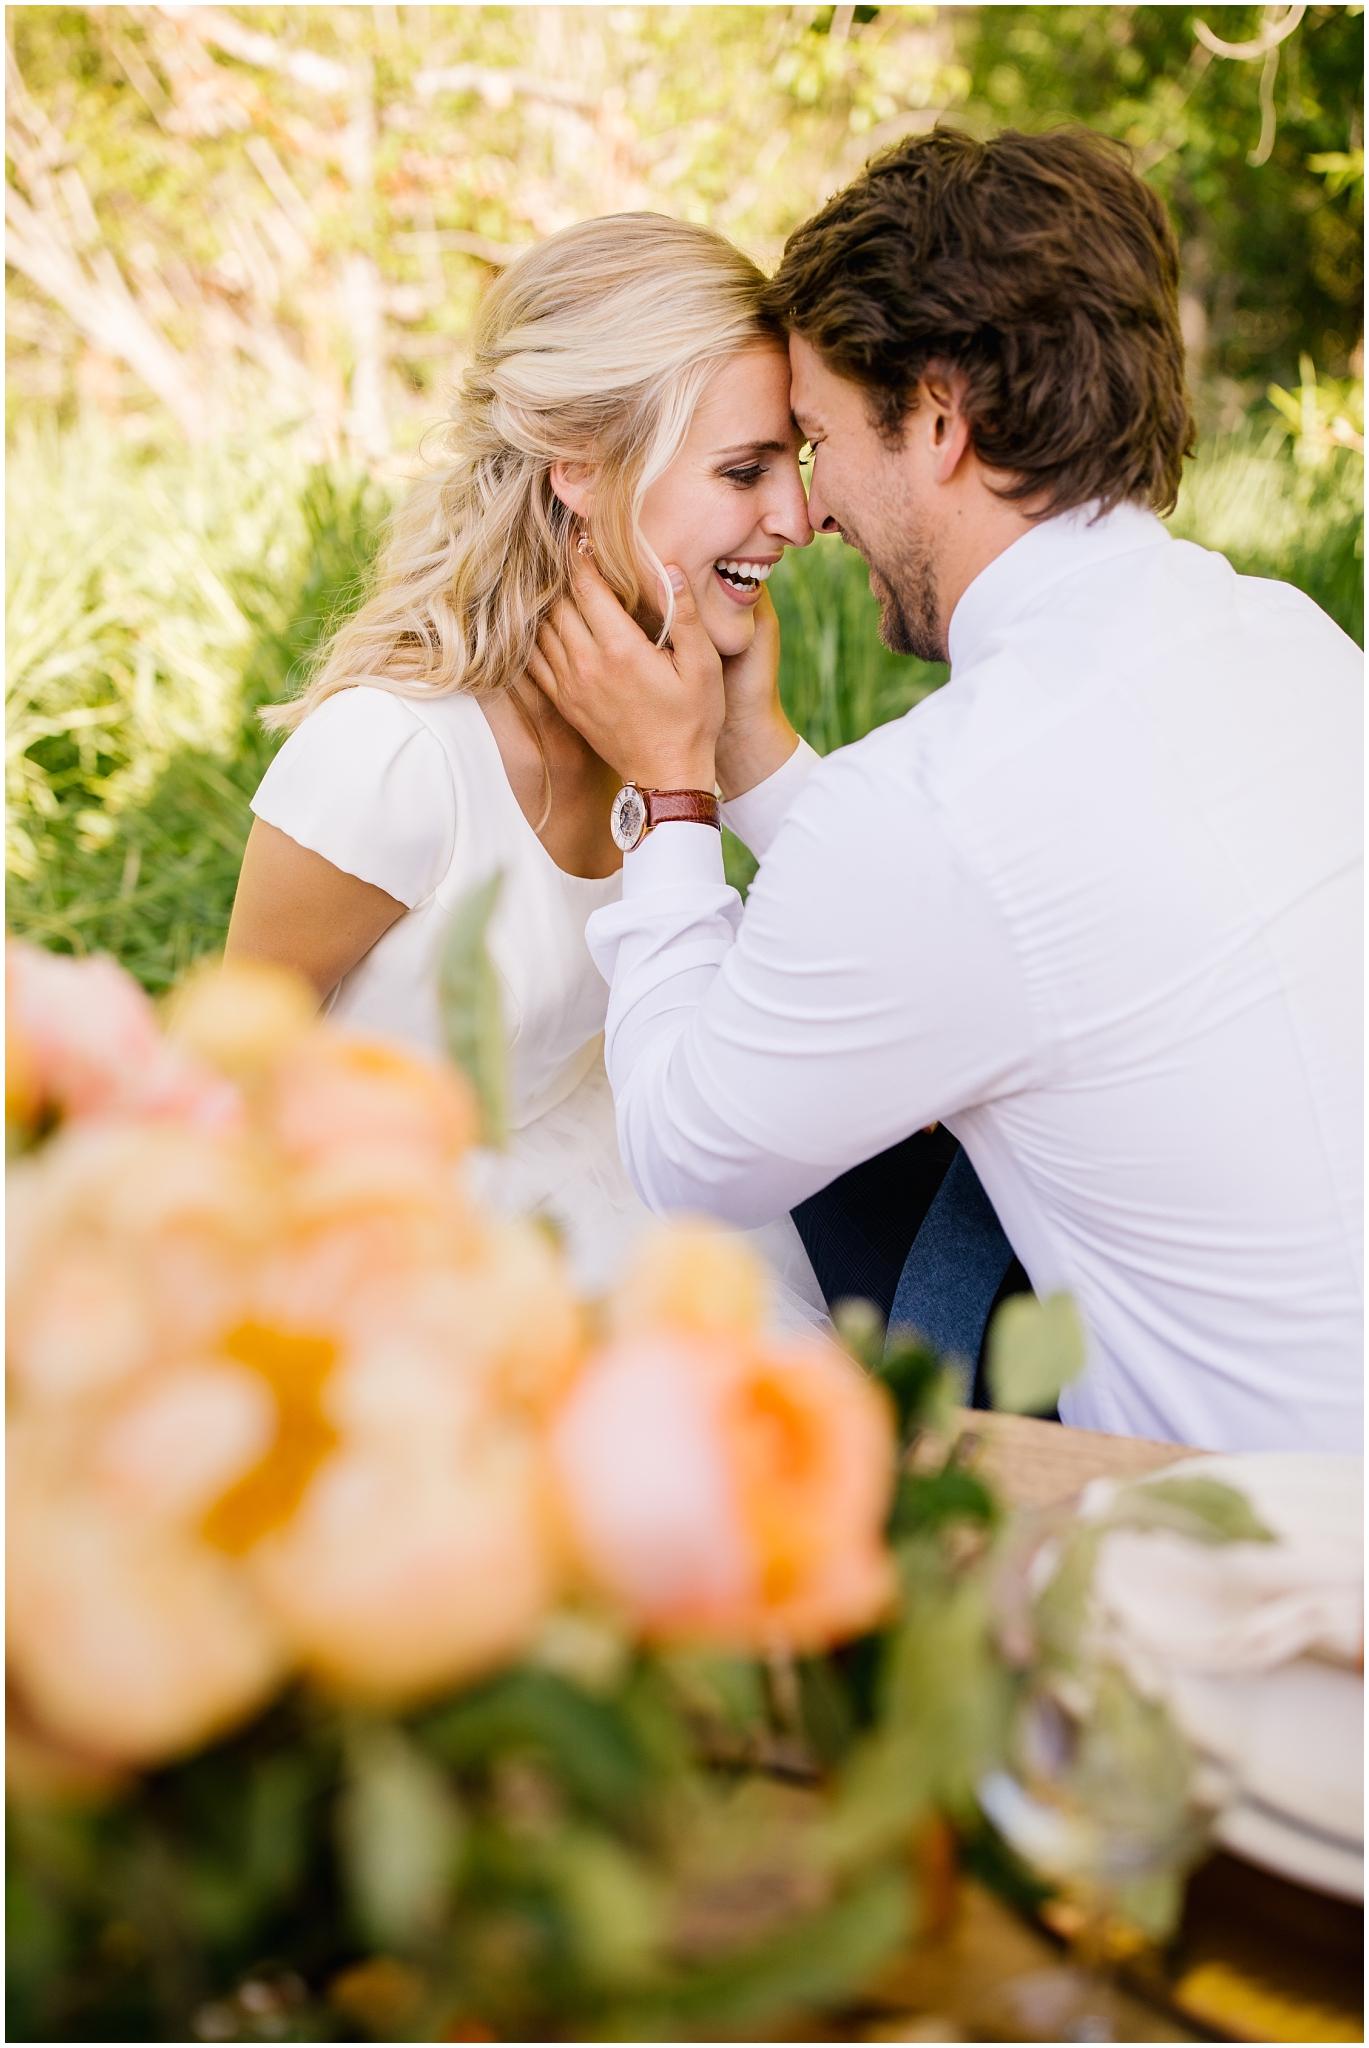 LakeShoot-28_Lizzie-B-Imagery-Utah-Wedding-Photographer-Salt-Lake-City-Park-City-Oakley.jpg